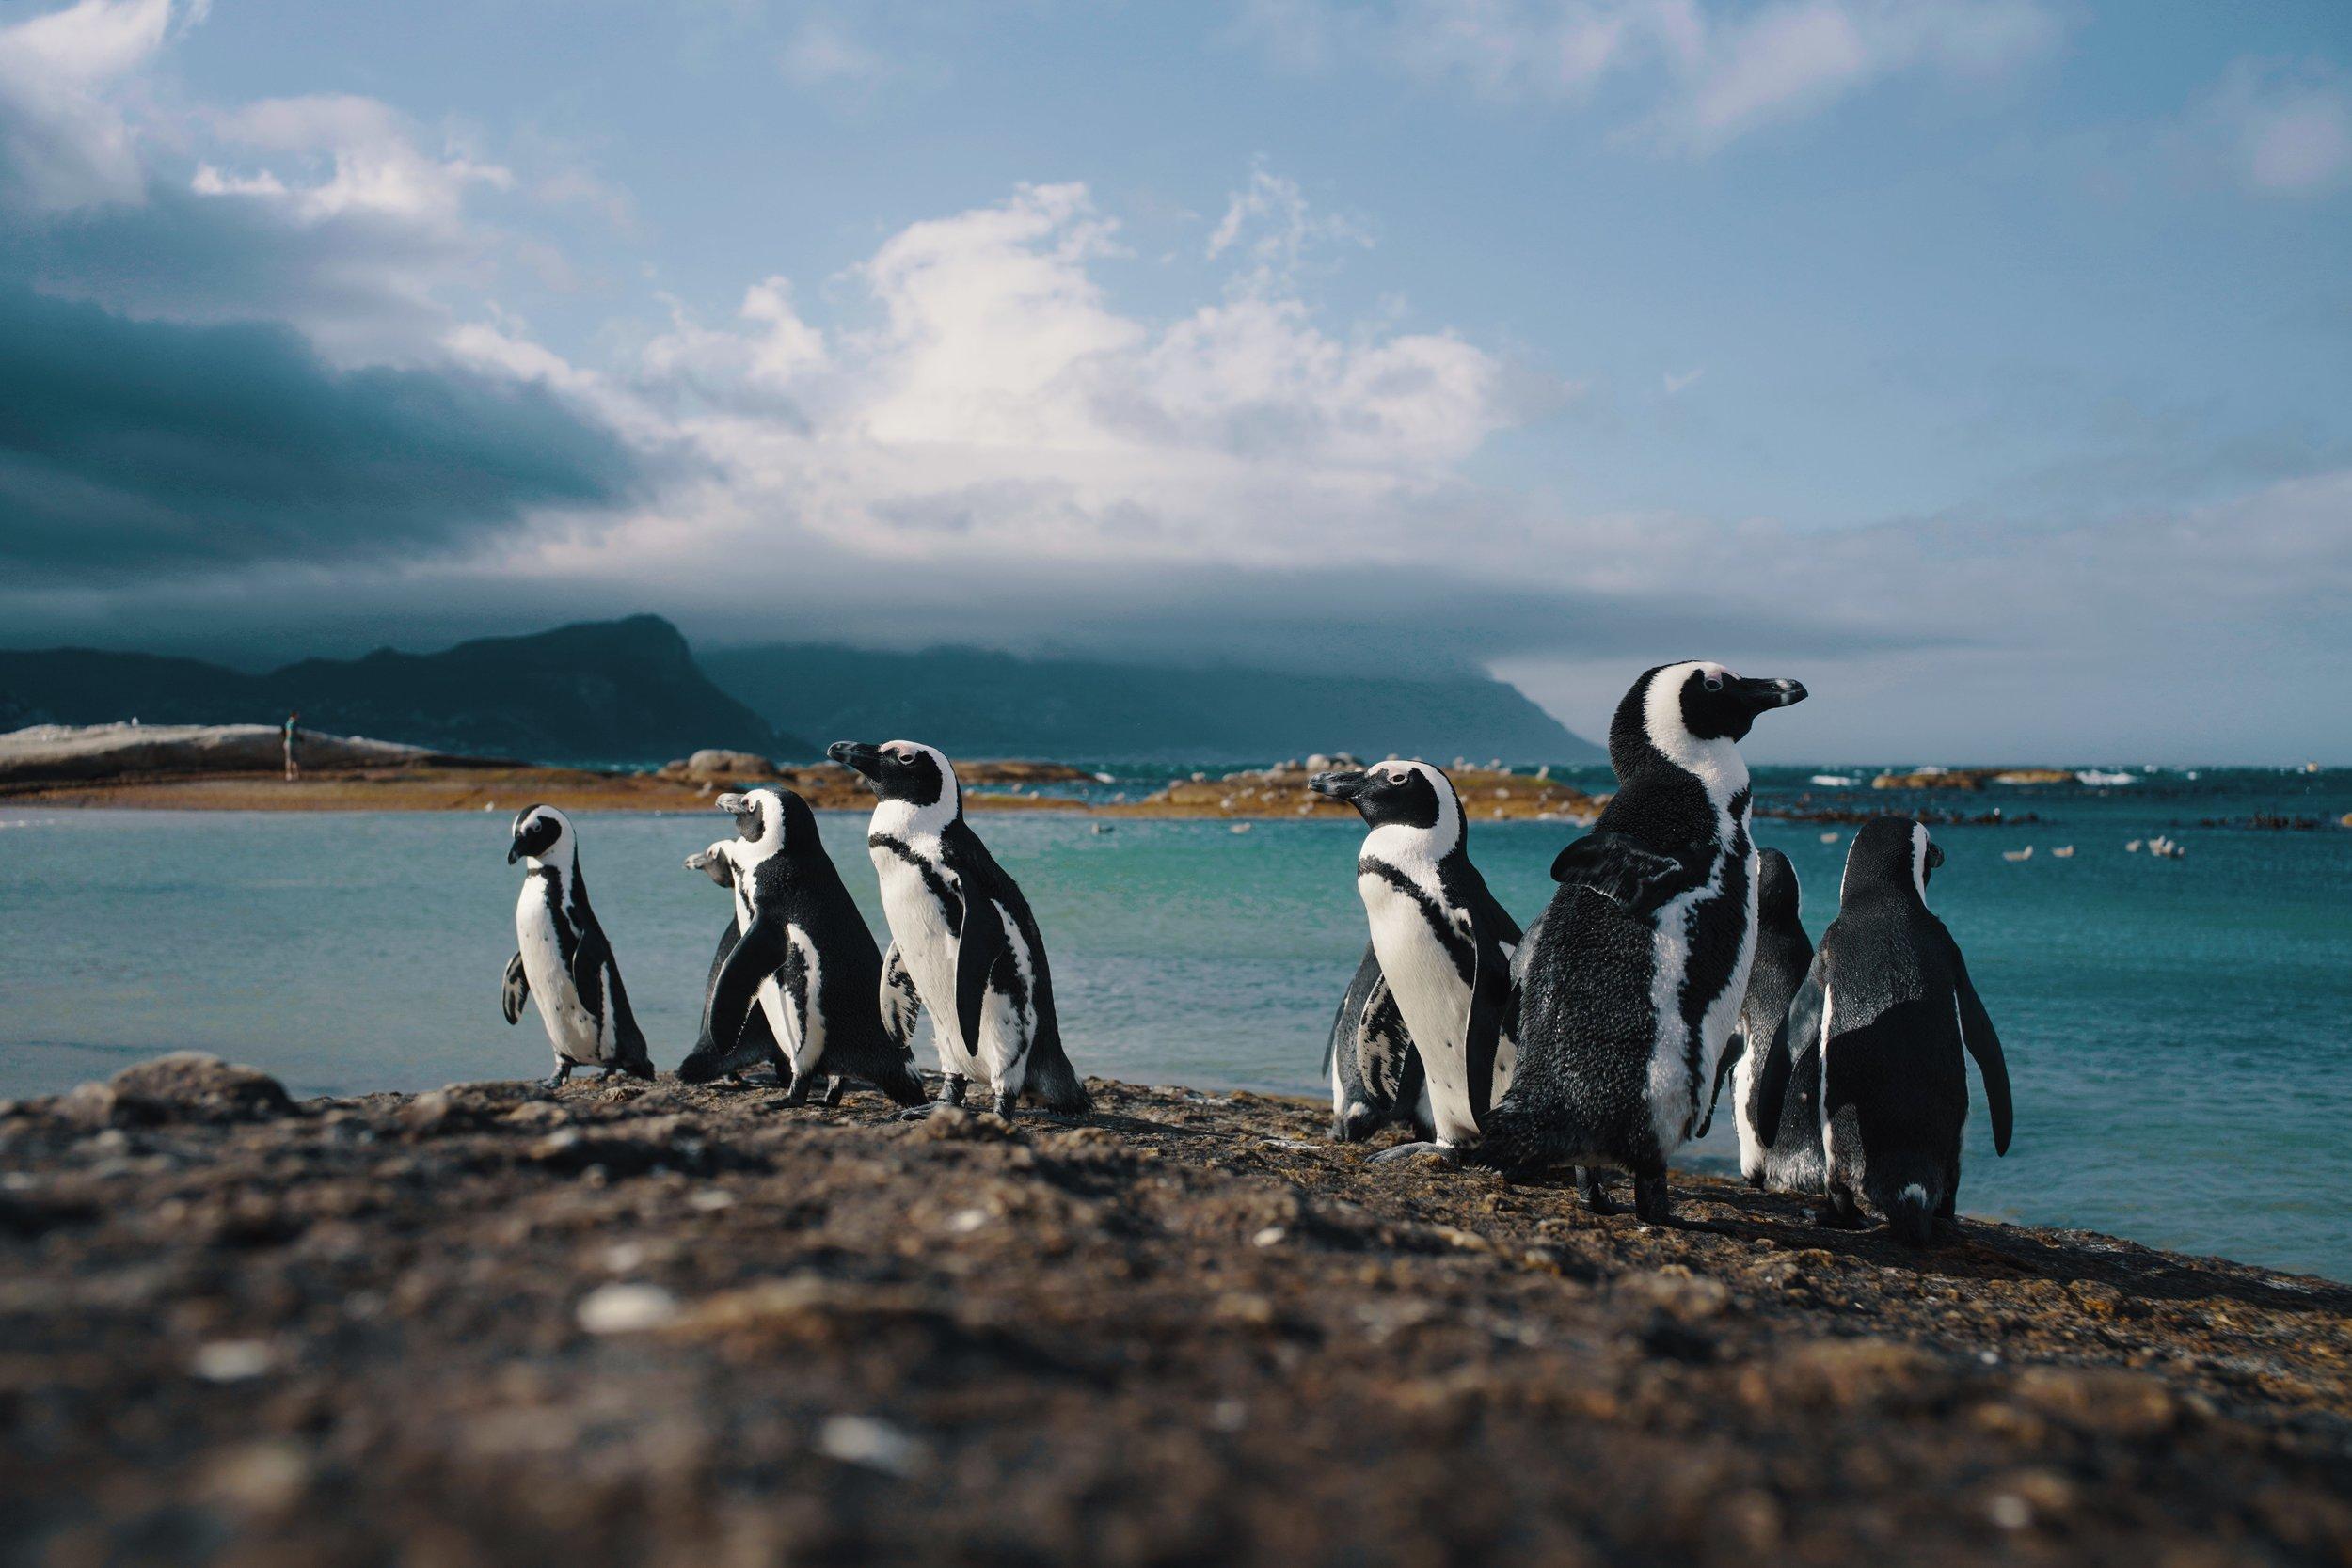 Boulders Beach, Cape Town 2018. By CJ Kask.